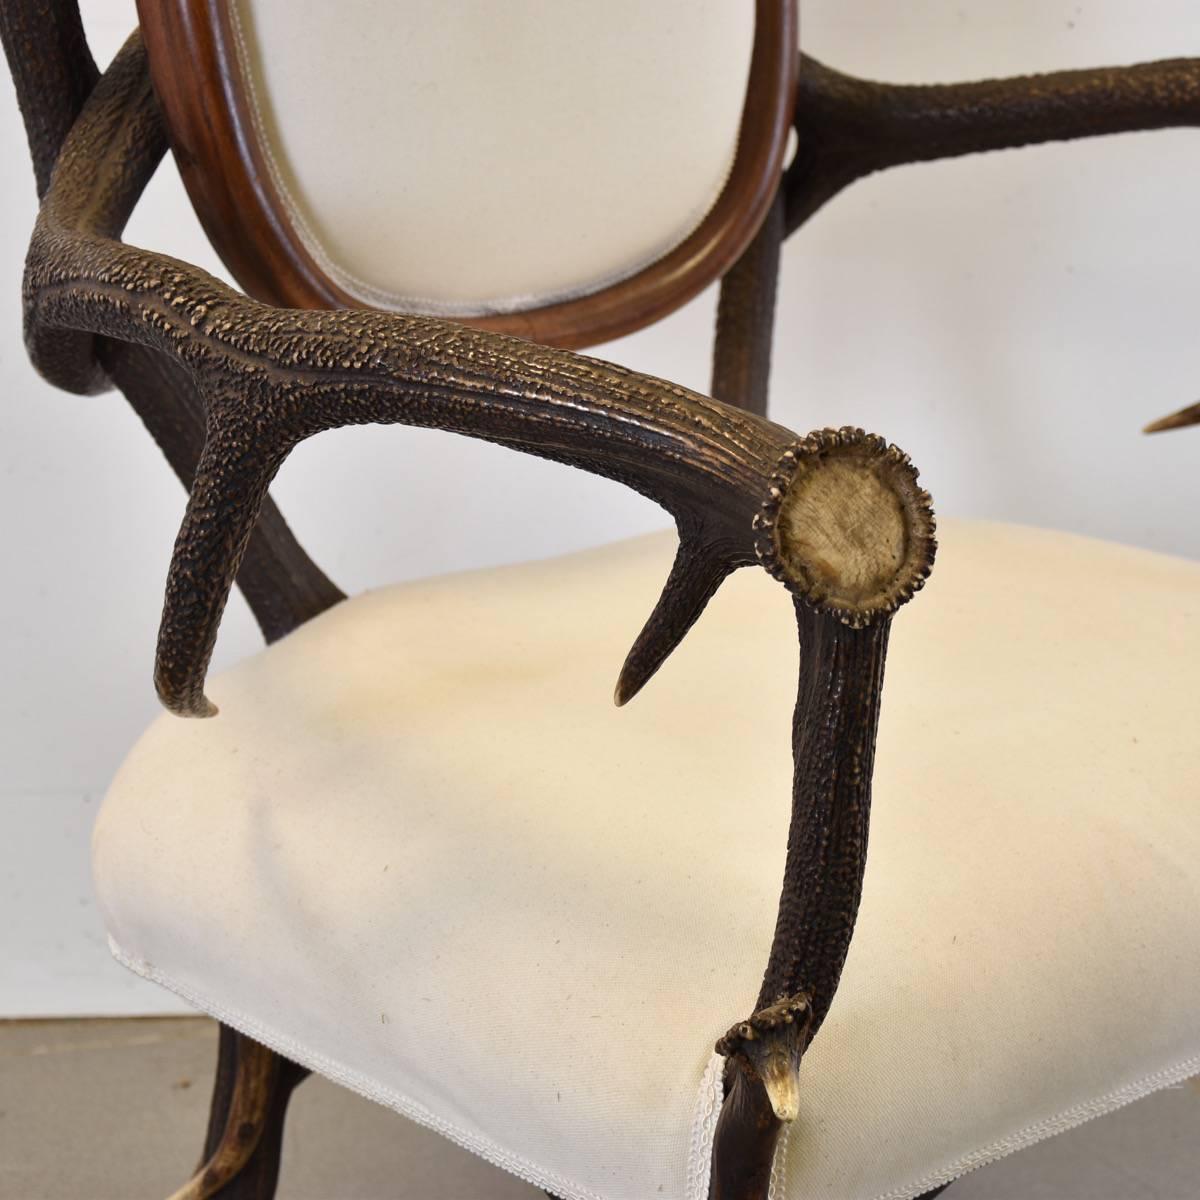 Decorative Deer Antler Hunting Chair Antique Furniture